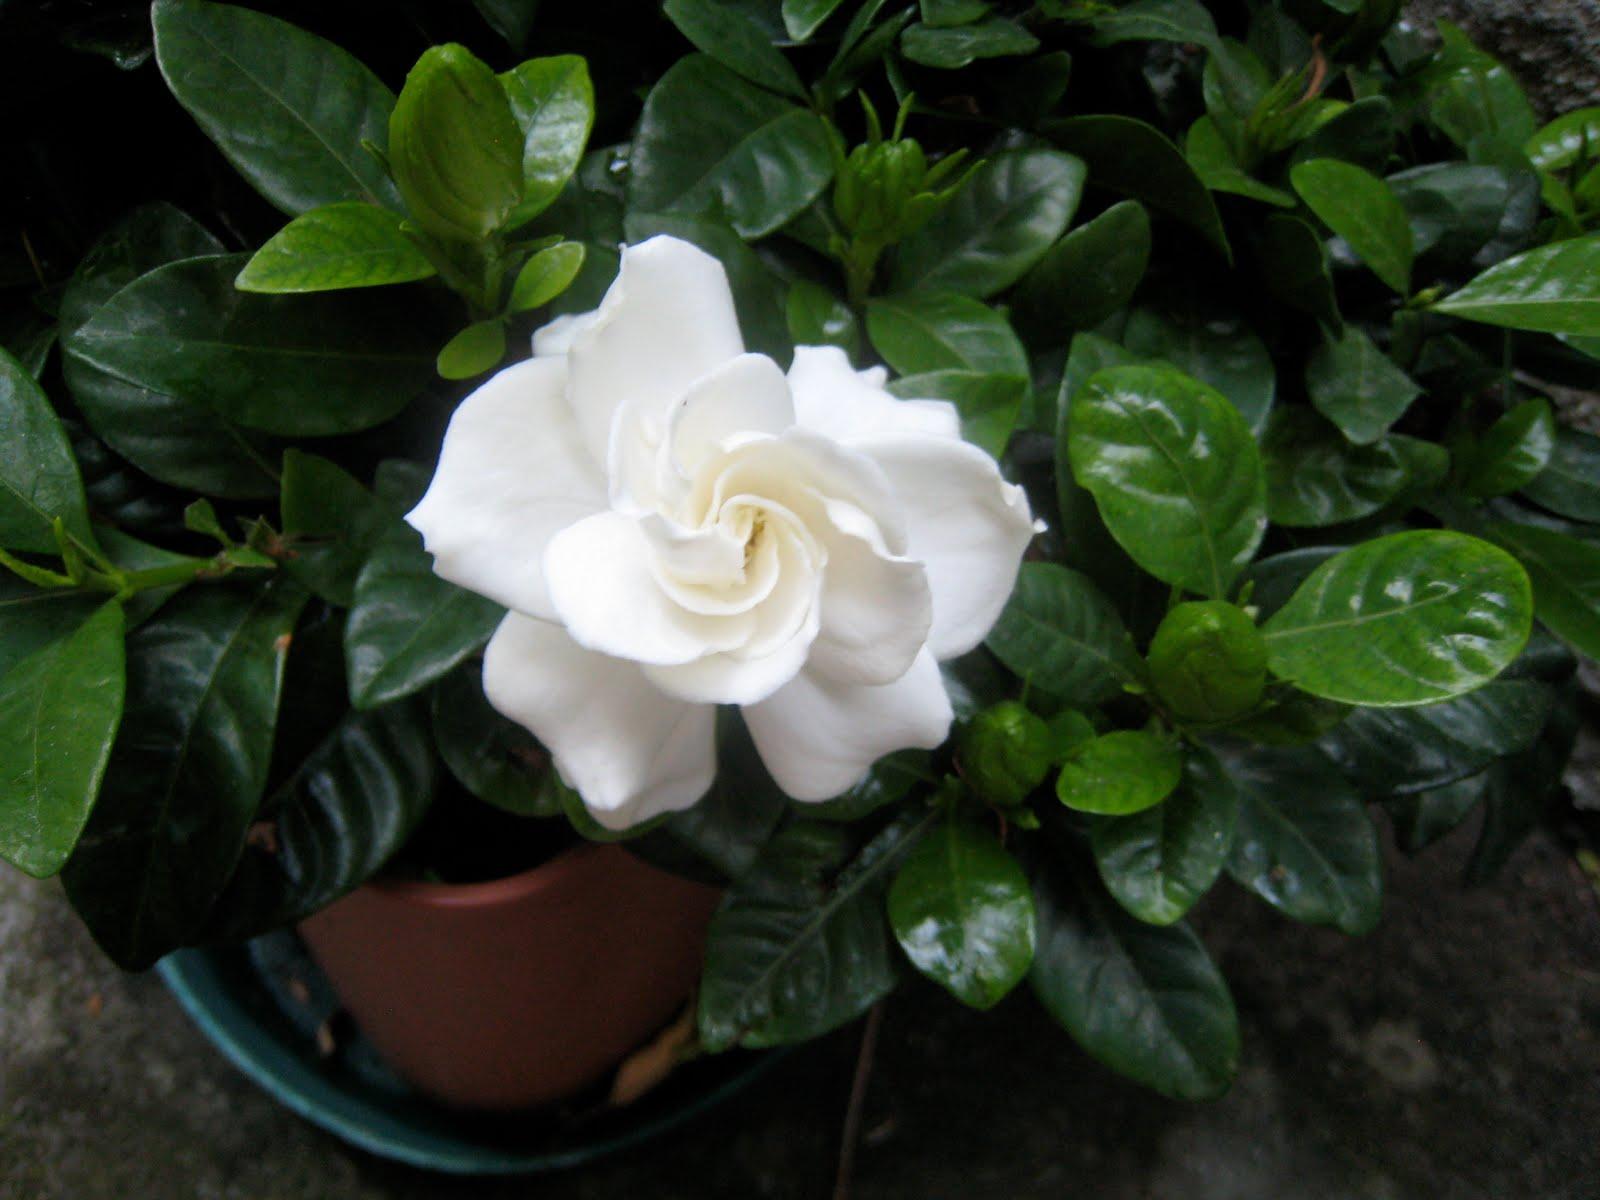 Fiori del mio giardino le mie gardenie - Gardenia pianta da giardino ...